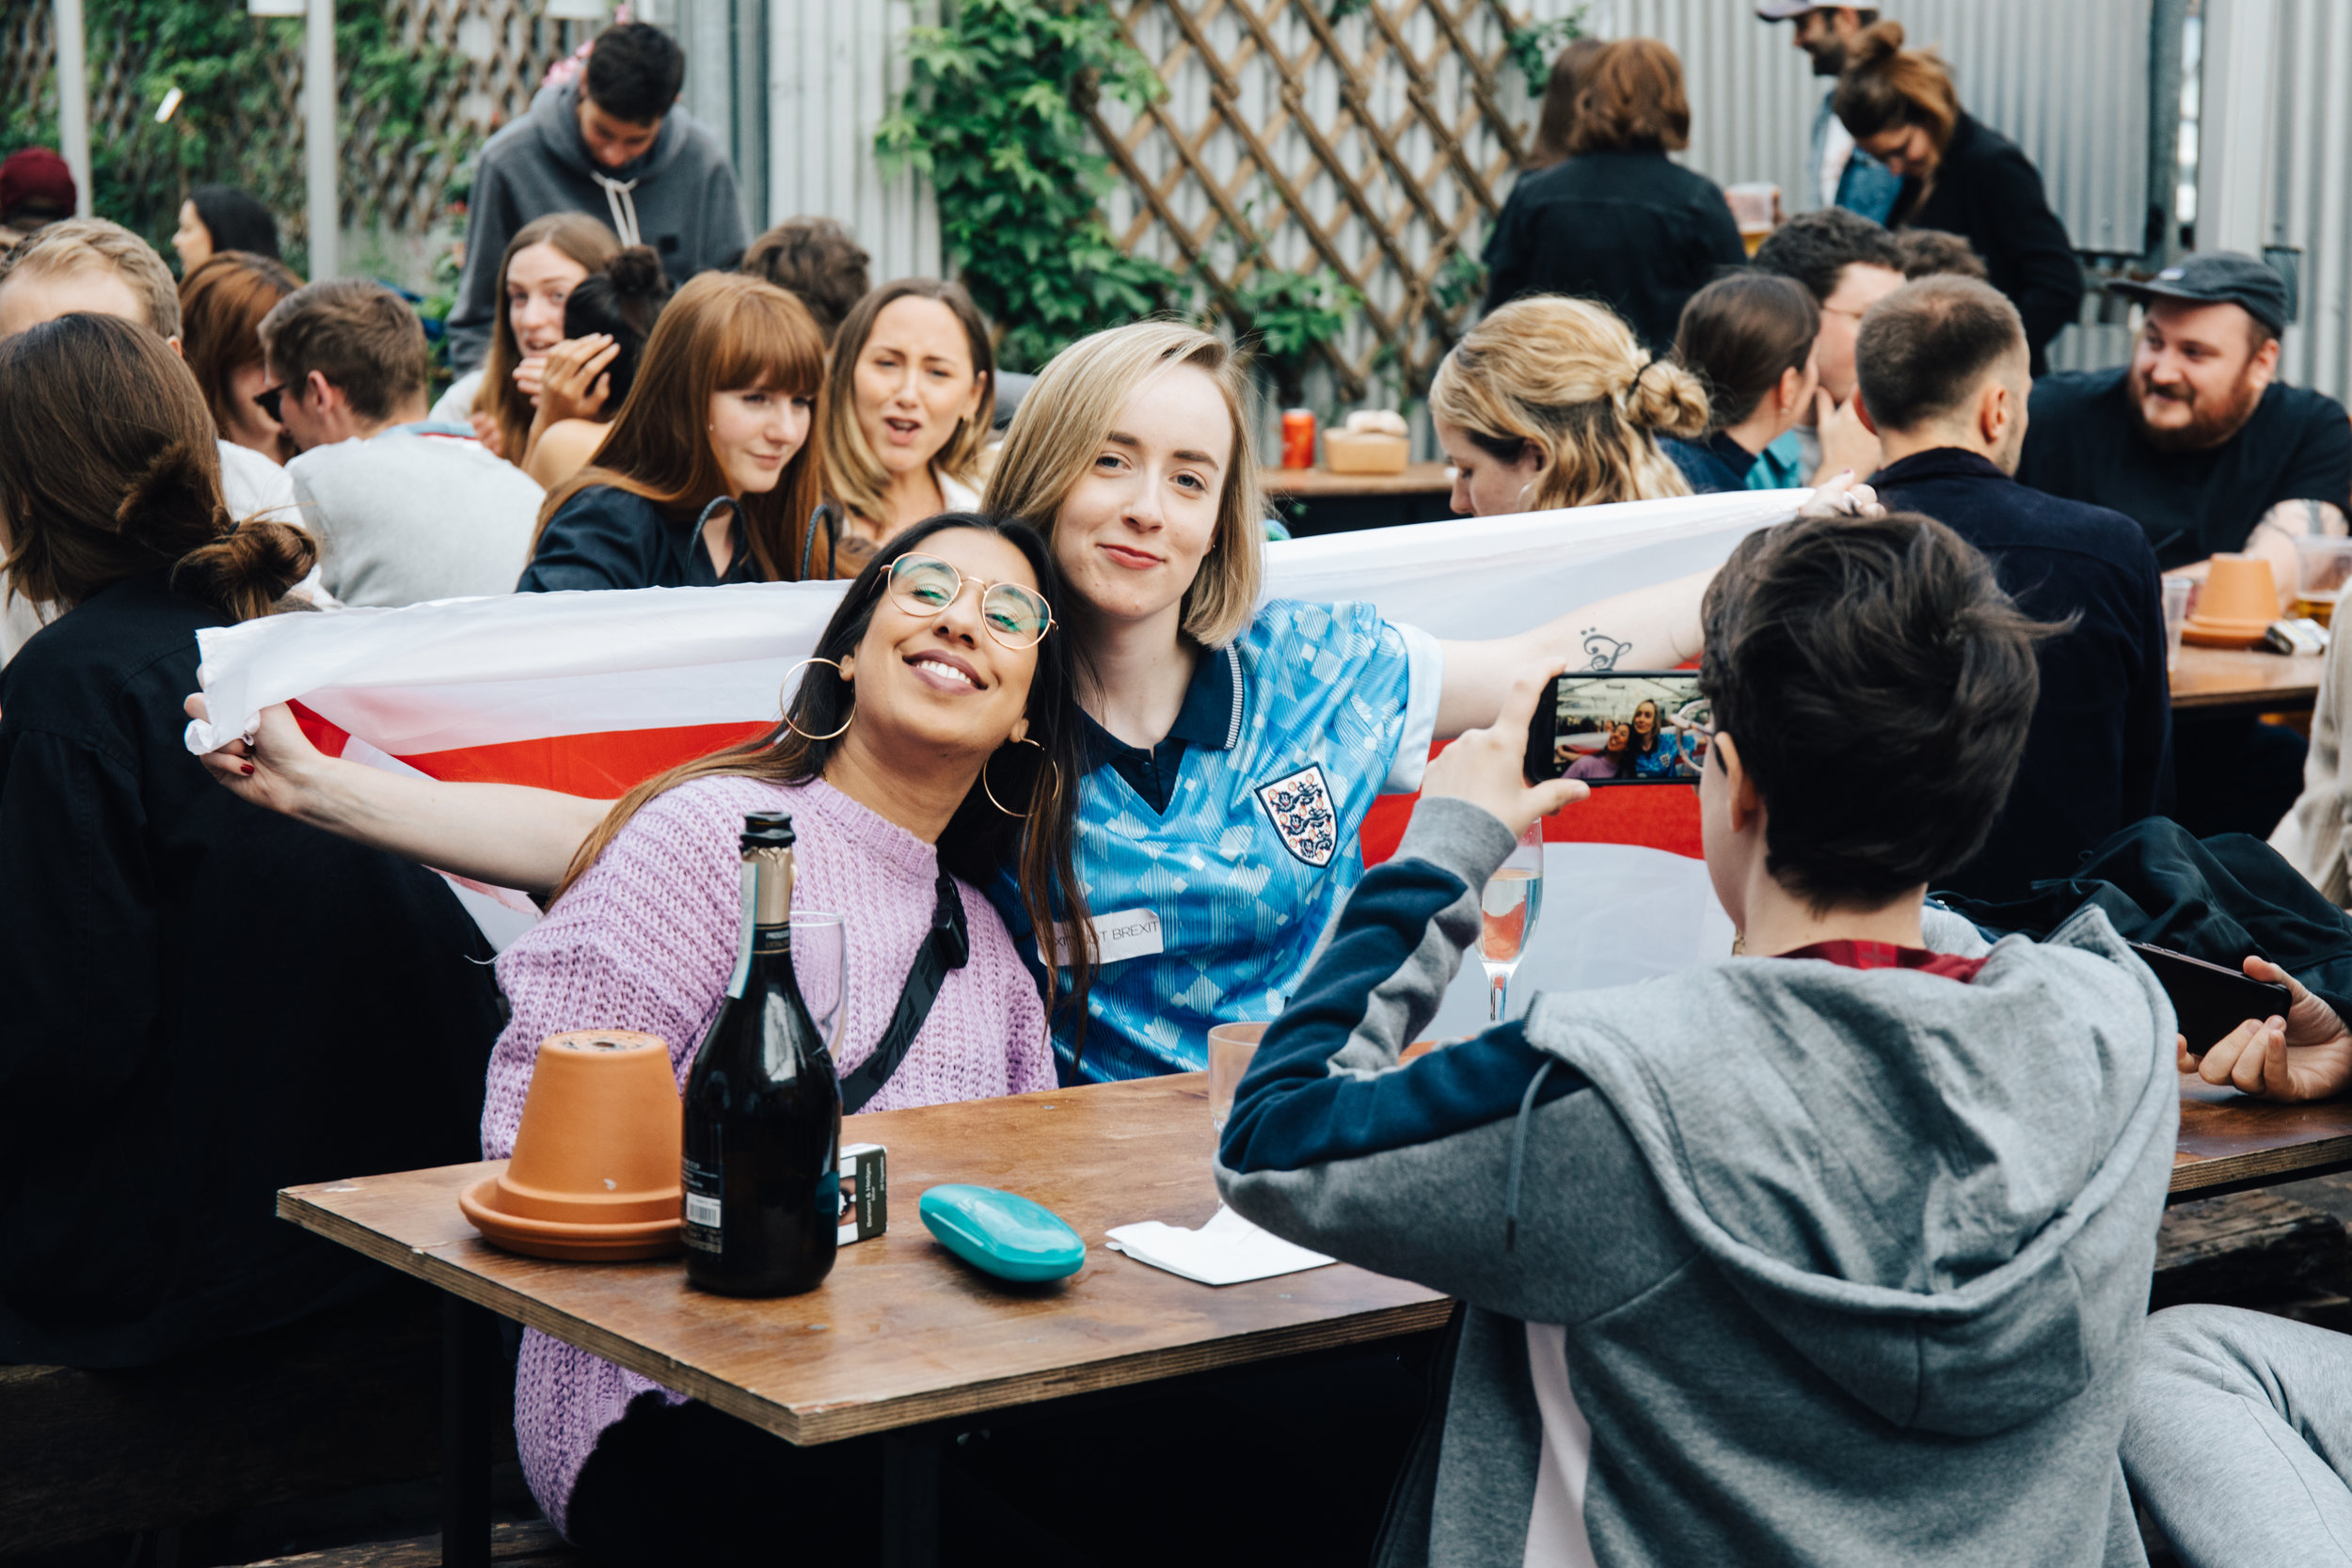 This Fan Girl screening at Peckham Springs